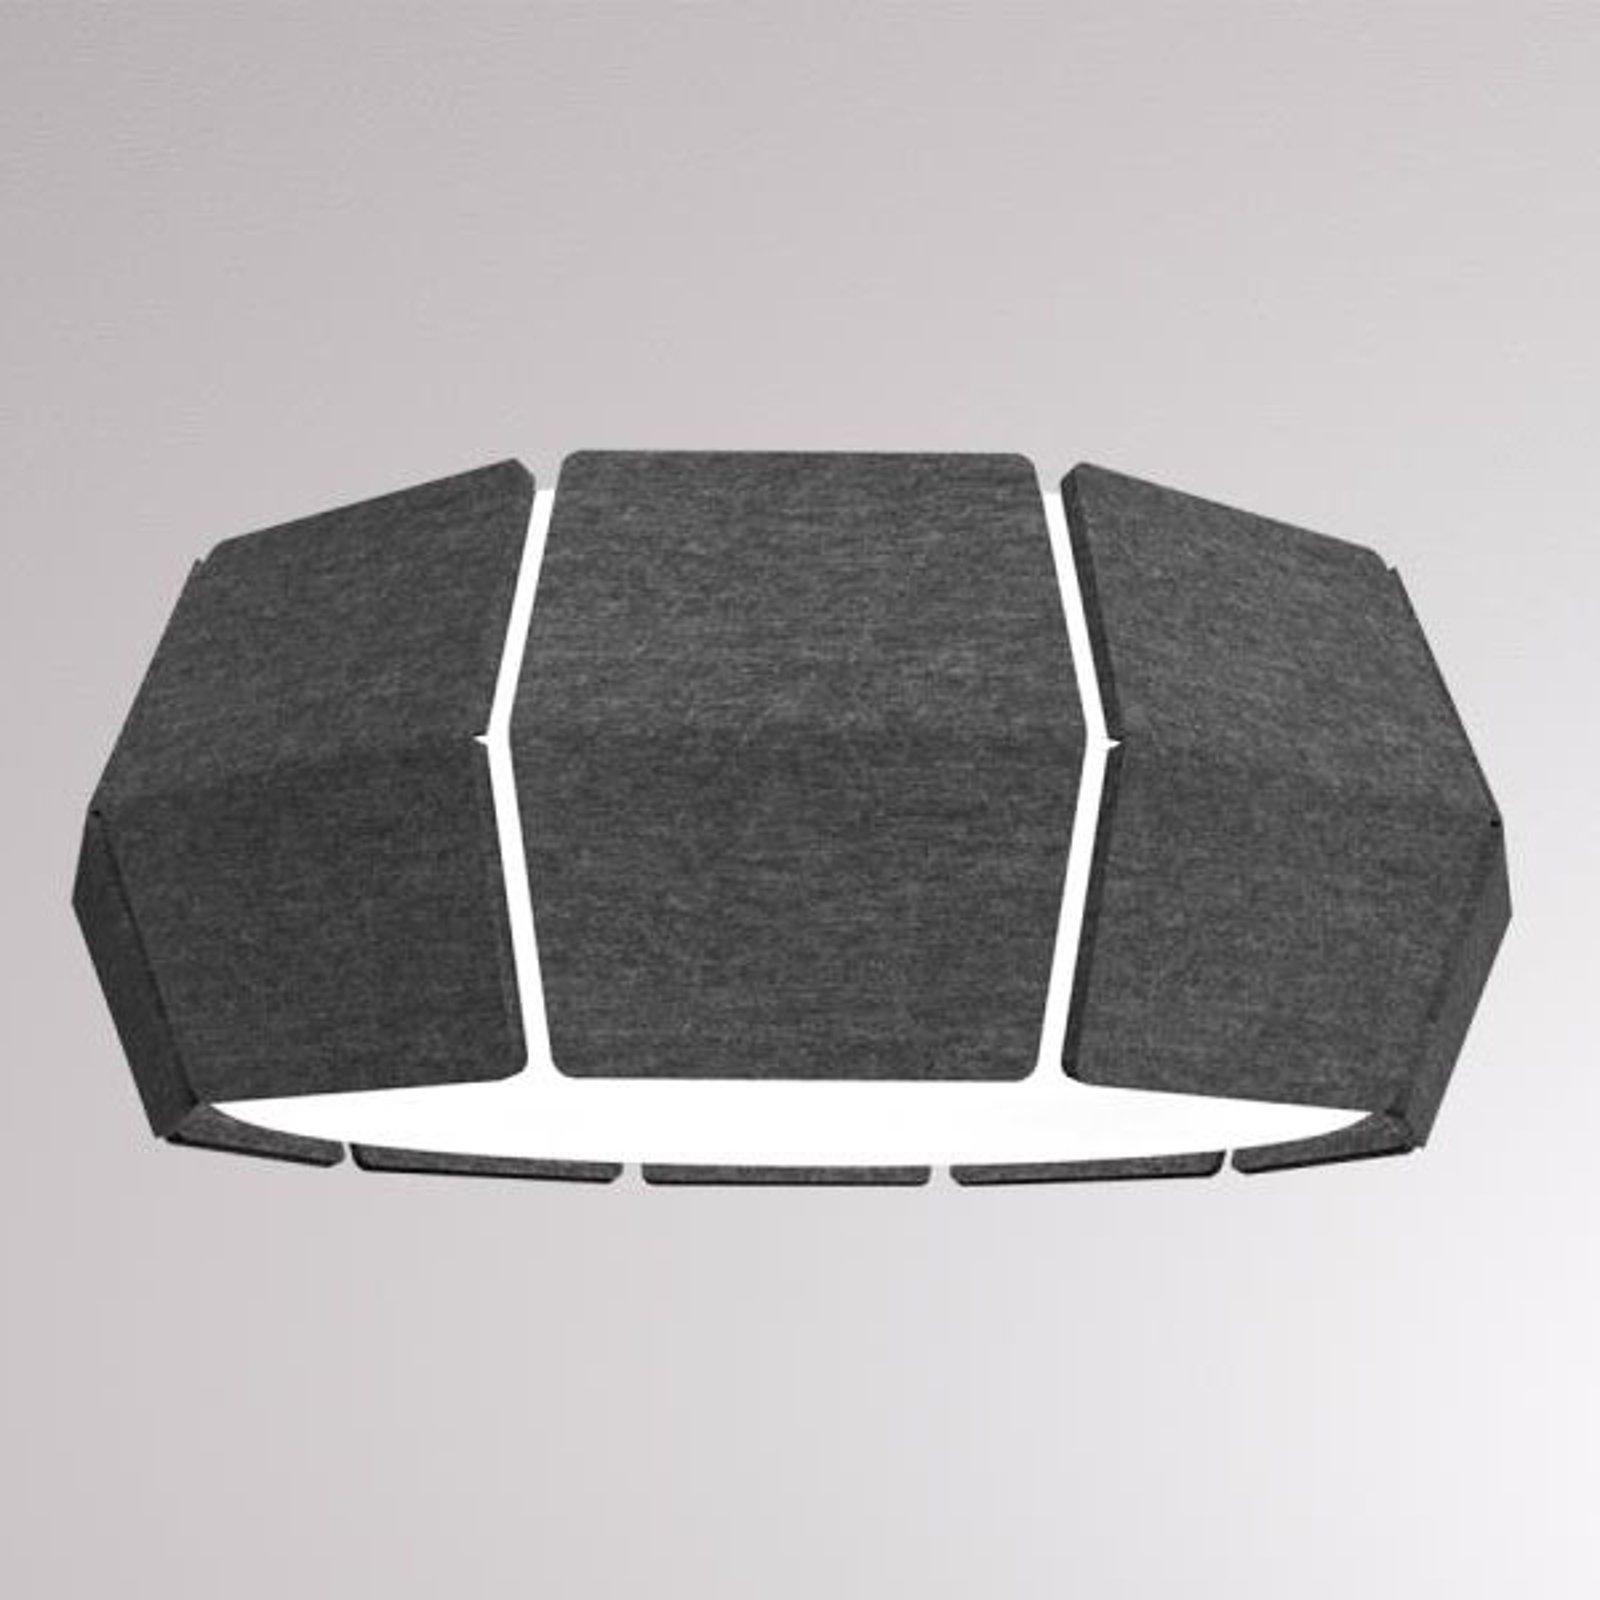 LOUM Decafelt LED-taklampe Ø 54 cm svart